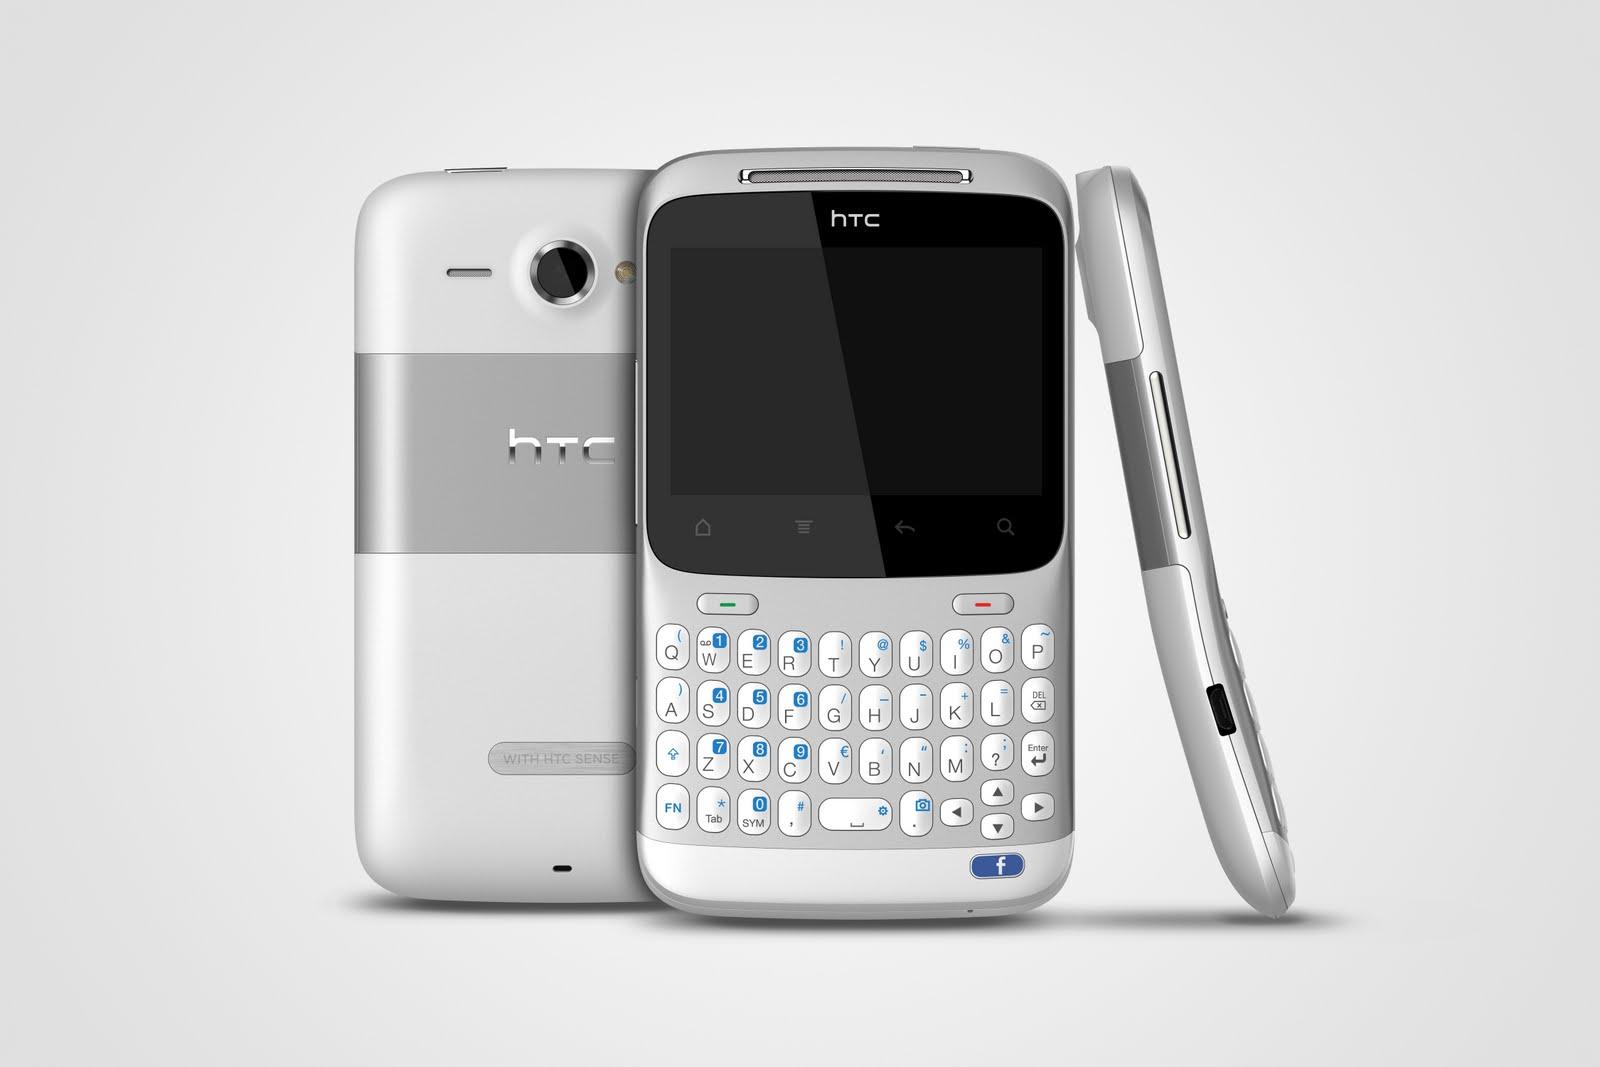 http://1.bp.blogspot.com/-KyUpFuyvrJY/TWaJNpZ6txI/AAAAAAAAAHQ/GcSG0H5hM78/s1600/htc-chacha-three-mobile.jpg